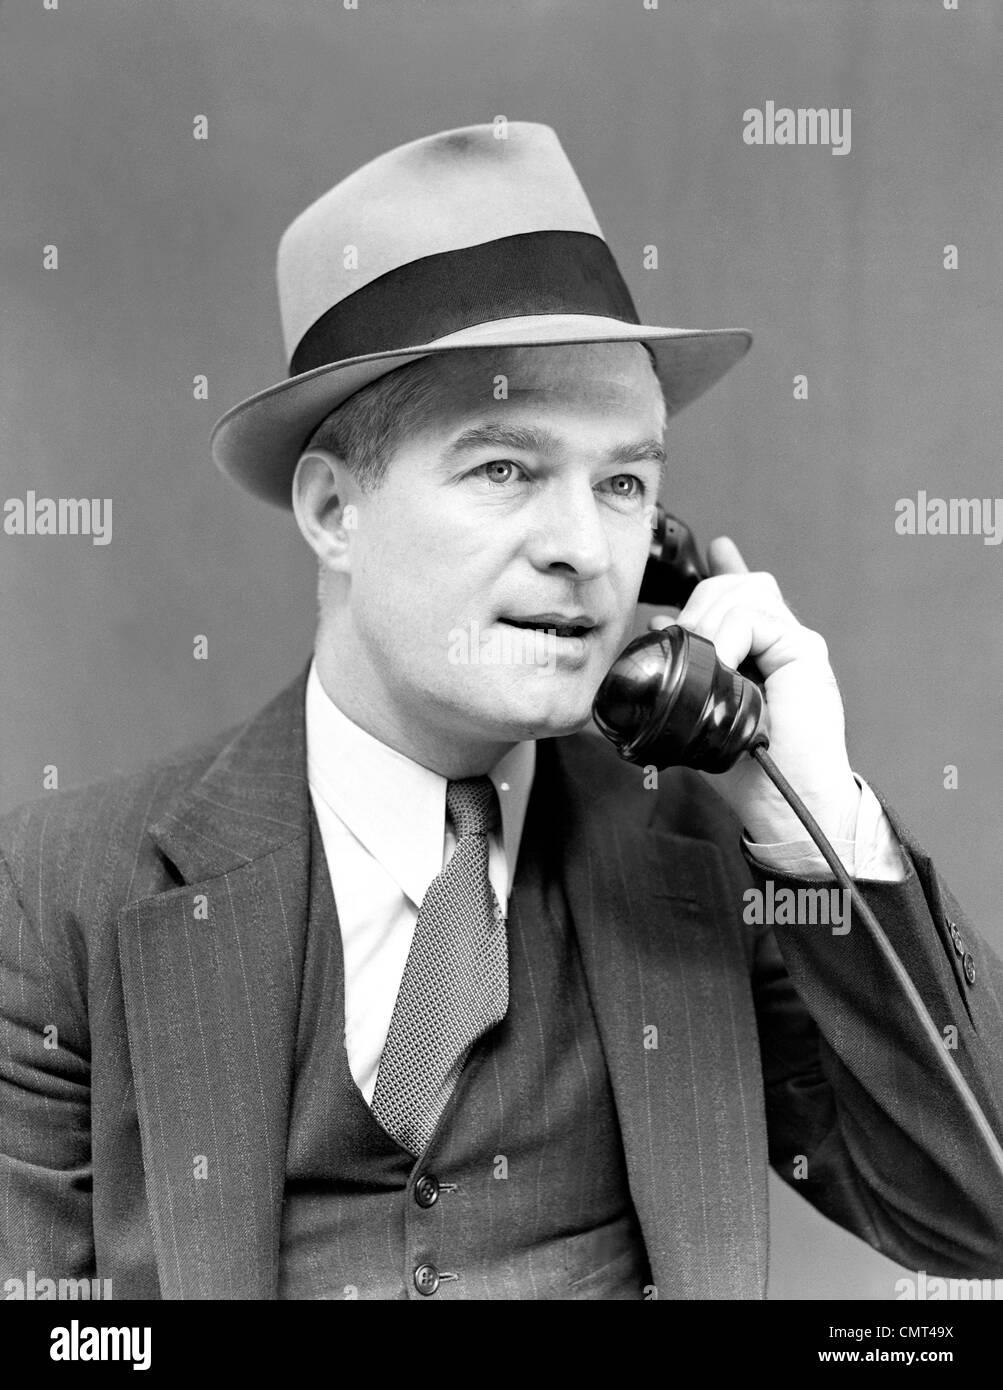 fa0d869edd2a3 1930s 1940s MAN WEARING HAT SUIT   VEST   NECKTIE TALKING ON TELEPHONE  SERIOUS EXPRESSION PORTRAIT